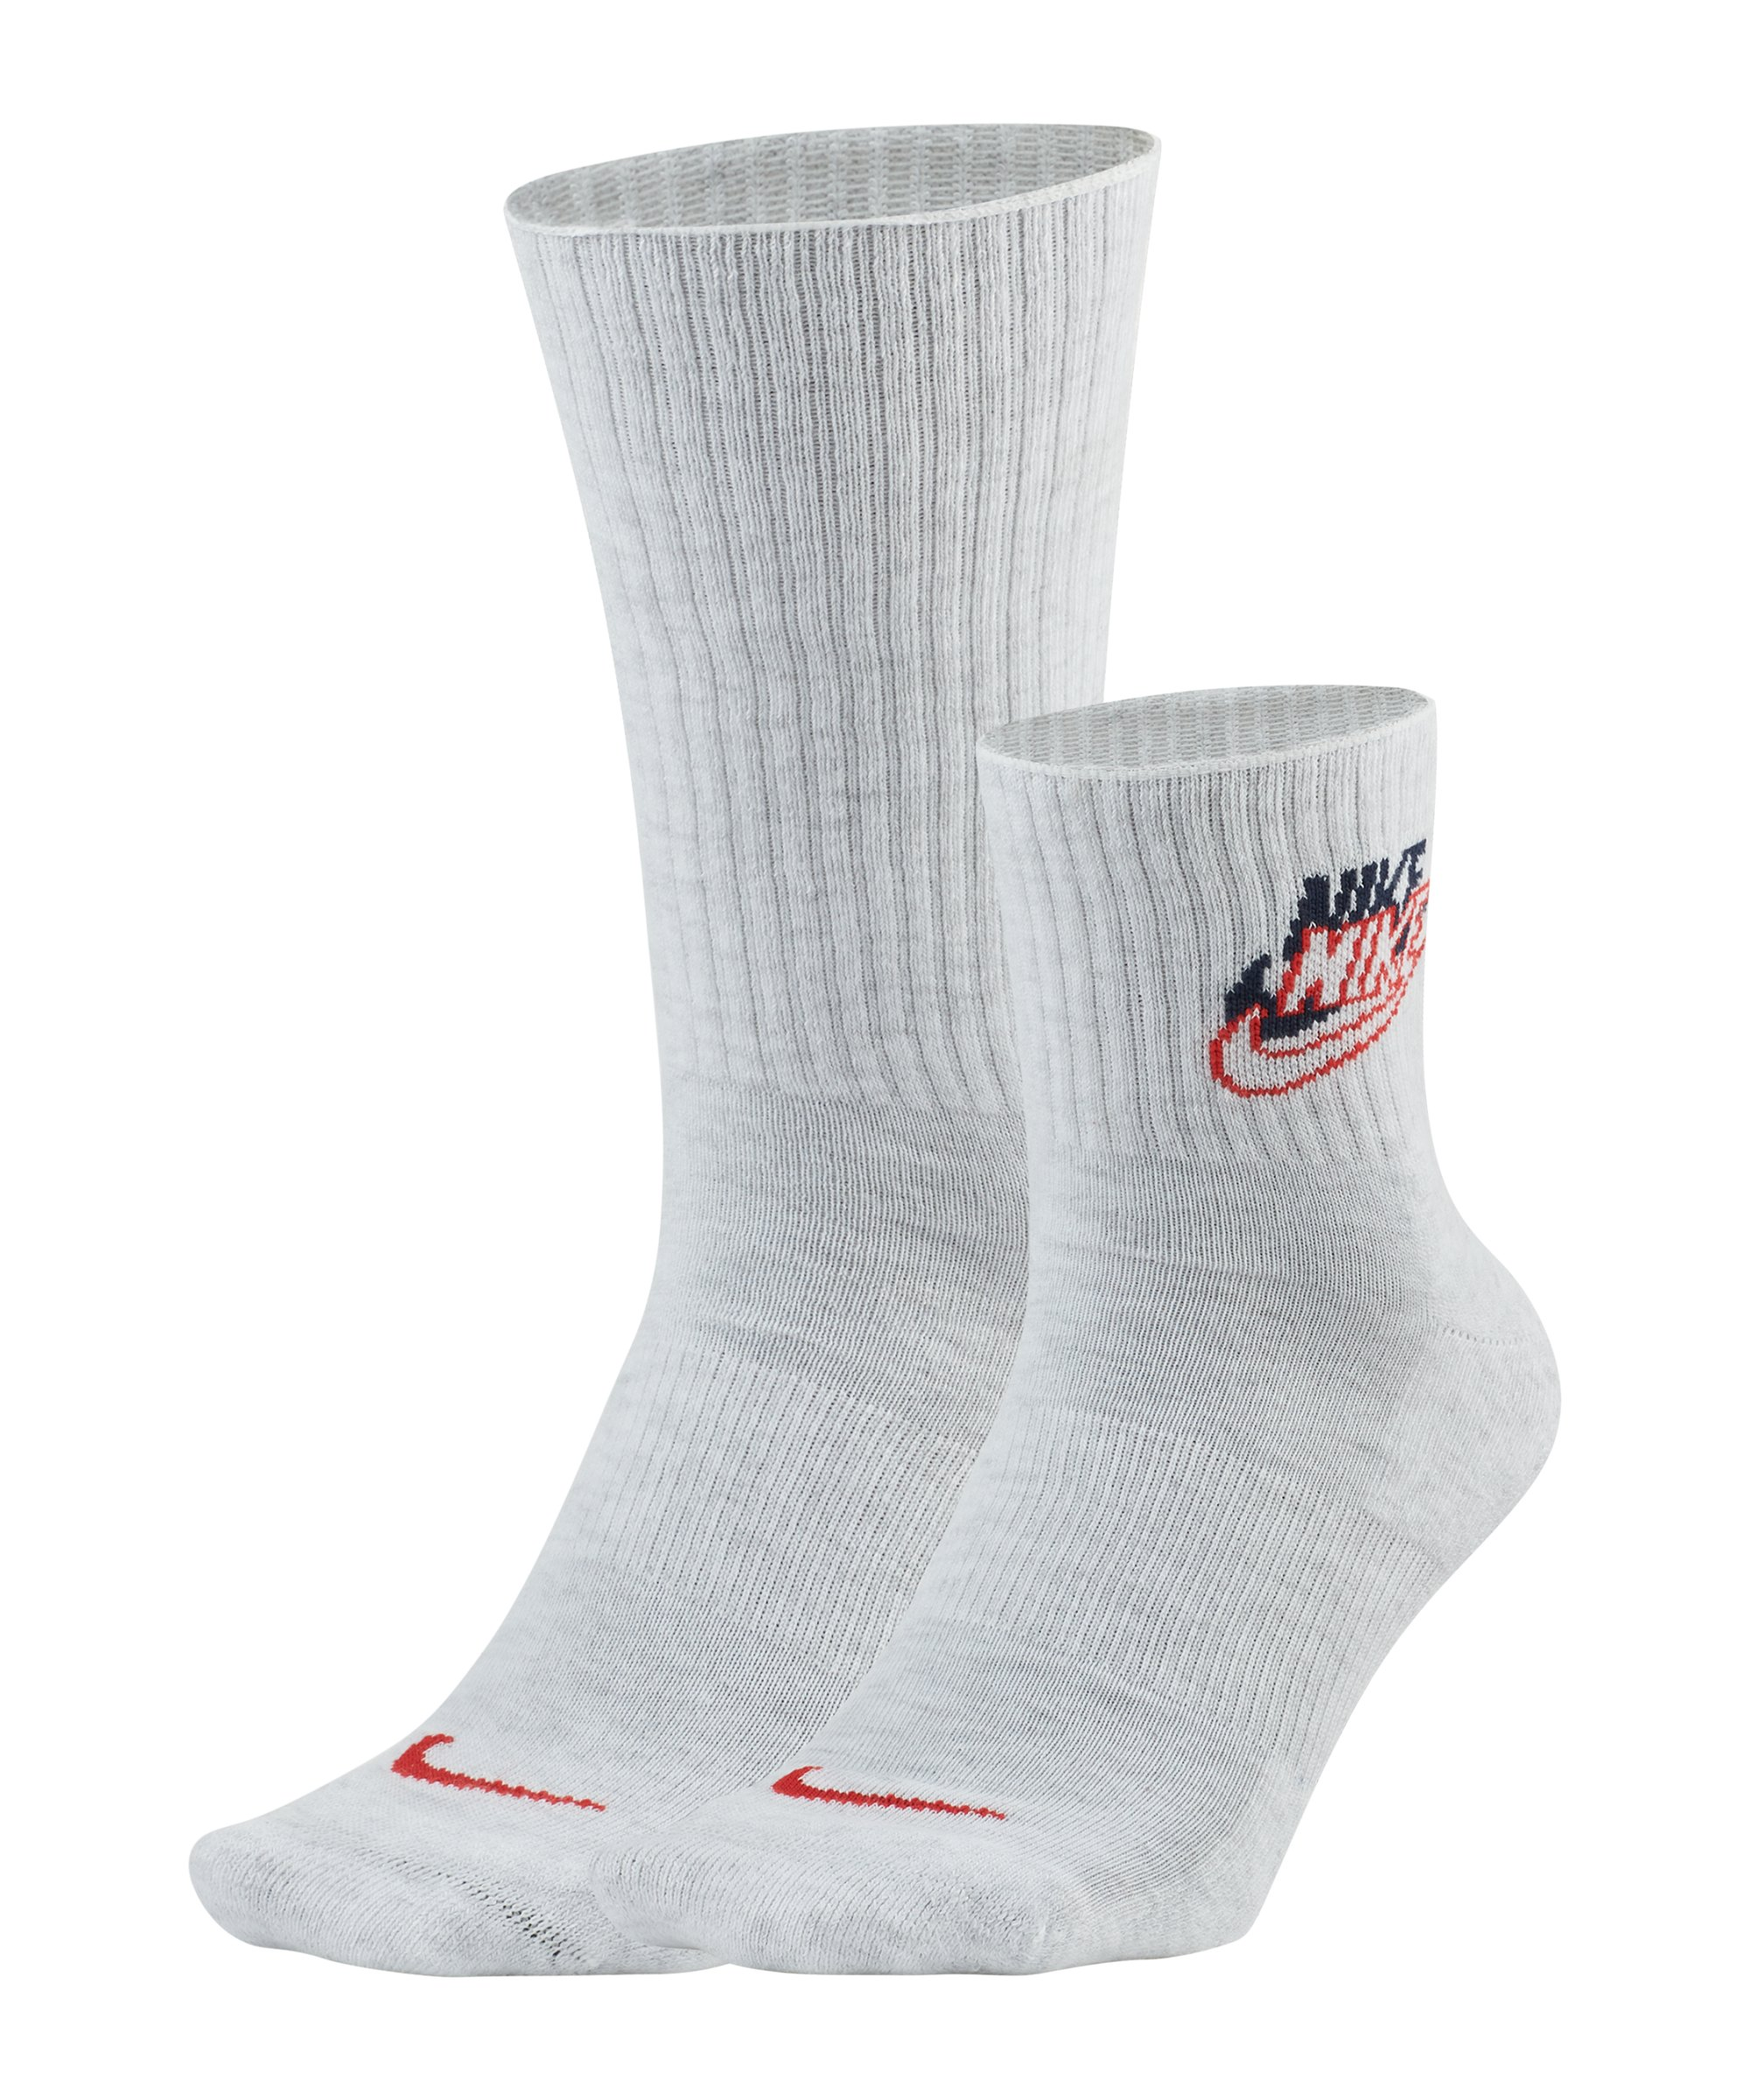 Nike Heritage Socken 2er Pack F903 - weiss